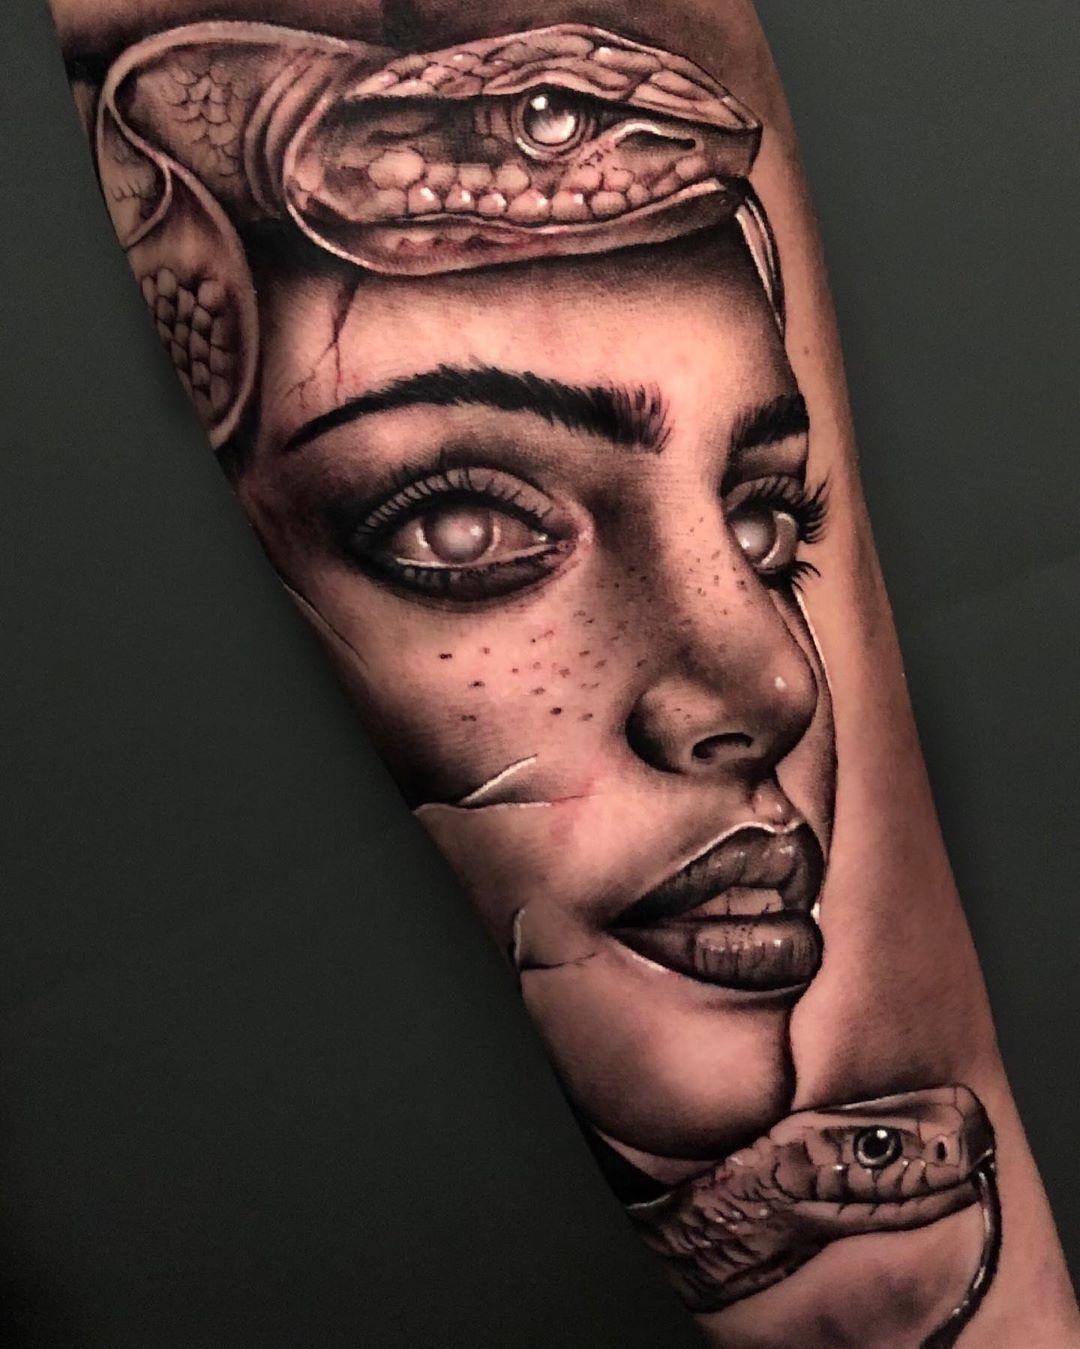 followforfollow,berlin,followmeciudadreal,ciudadreal,tomelloso,almagro,puertollano,tatuajesenpuertollano,tatuajesendaimiel,ciudadrealtattoo,ciudadrealtatuajes,tatuajesciudadreal,follow,ciudadrealtatuajes,puertollano,tattooers,besttattooers,juantabasco,ciudadrealsetatua,ink,tatuajes,realiismo,realistictattoo,ciudadrealtattoo,tatuajesenpuertollano,traditionaltattoos,castillalamancha,ink,tattooart,zurichtattoo